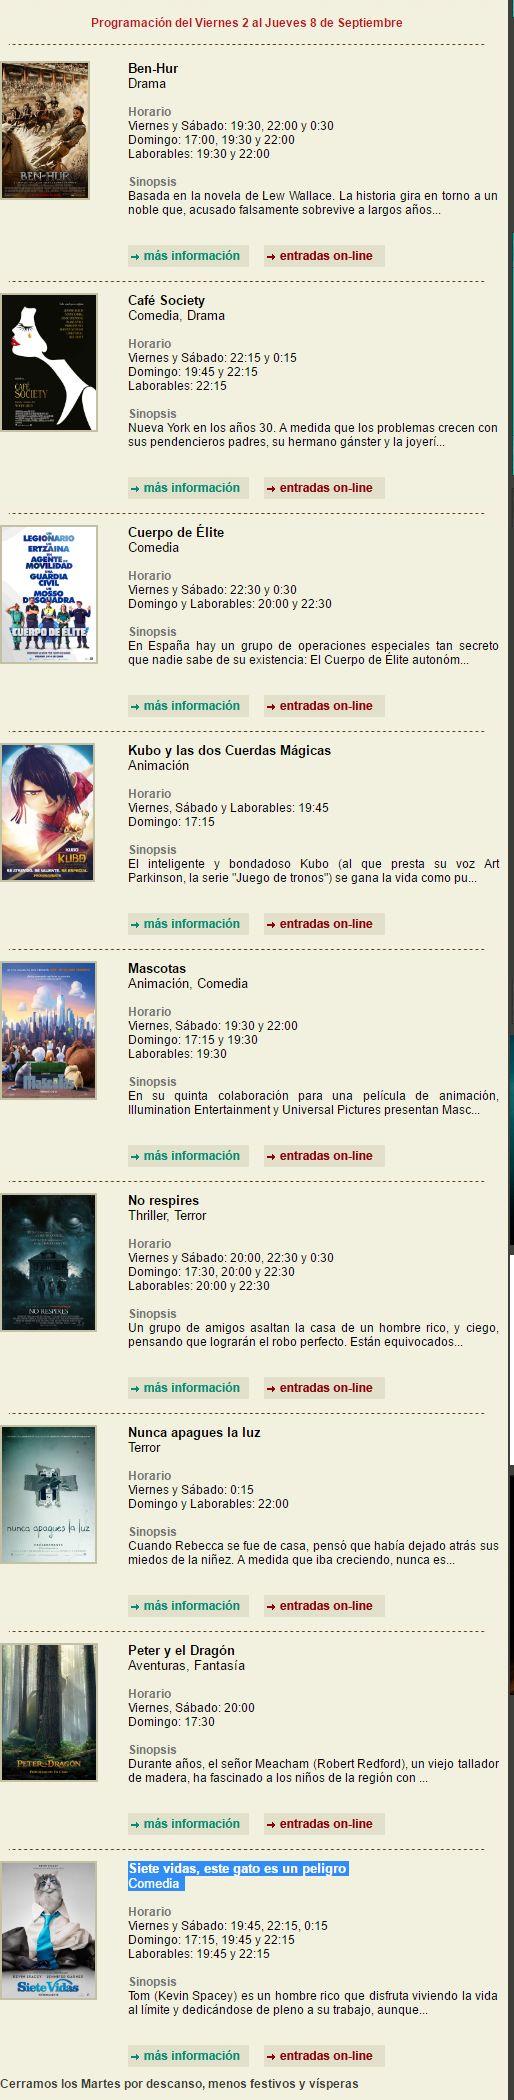 Cartelera Cinemancha del viernes 2 al jueves 8 de Septiembre - https://herencia.net/2016-09-02-cartelera-cinemancha-del-viernes-2-al-jueves-8-septiembre/?utm_source=PN&utm_medium=herencianet+pinterest&utm_campaign=SNAP%2BCartelera+Cinemancha+del+viernes+2+al+jueves+8+de+Septiembre